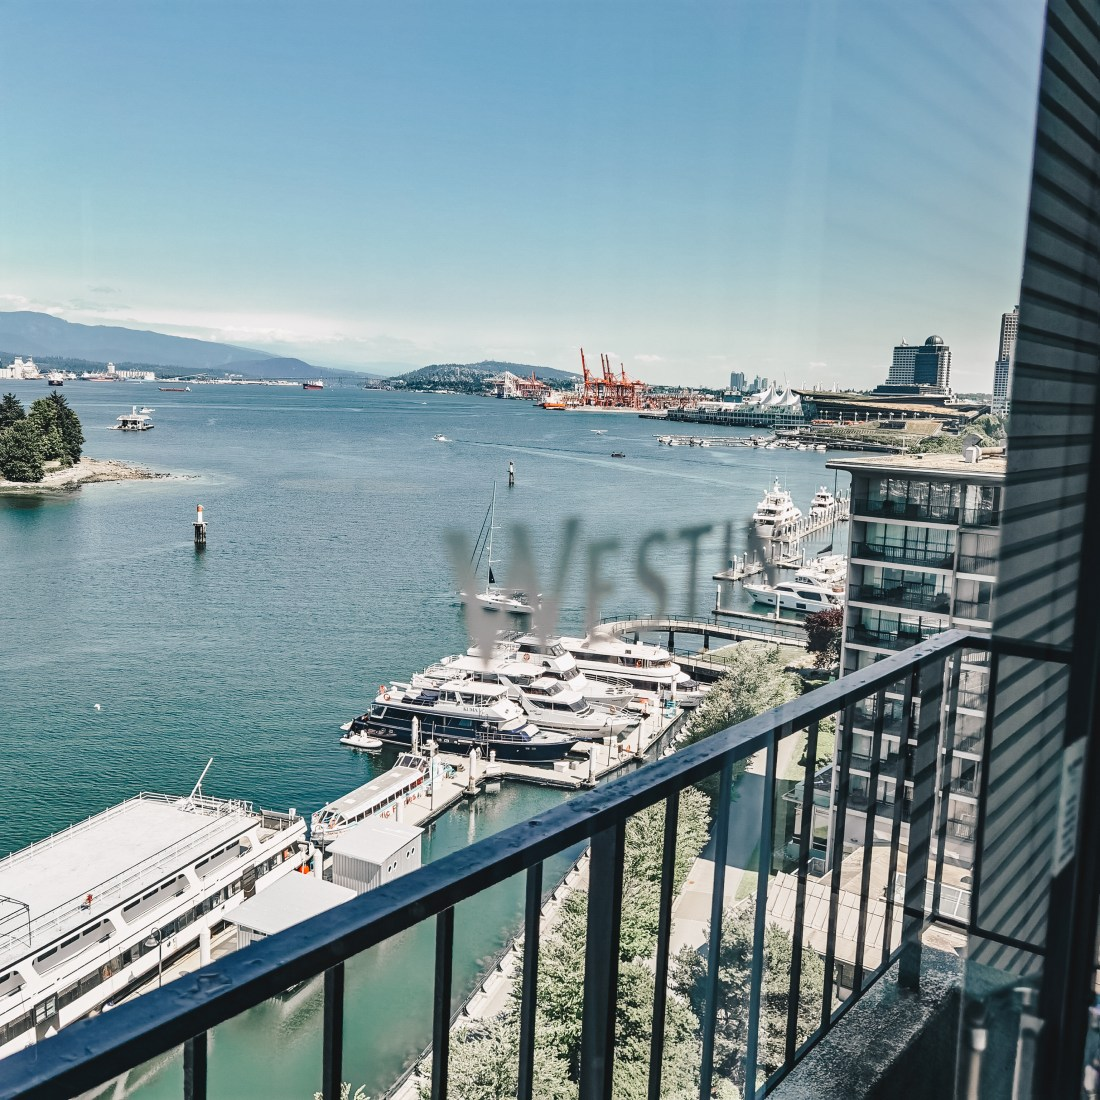 Westin Bayshore Vancouver Waterfront - View